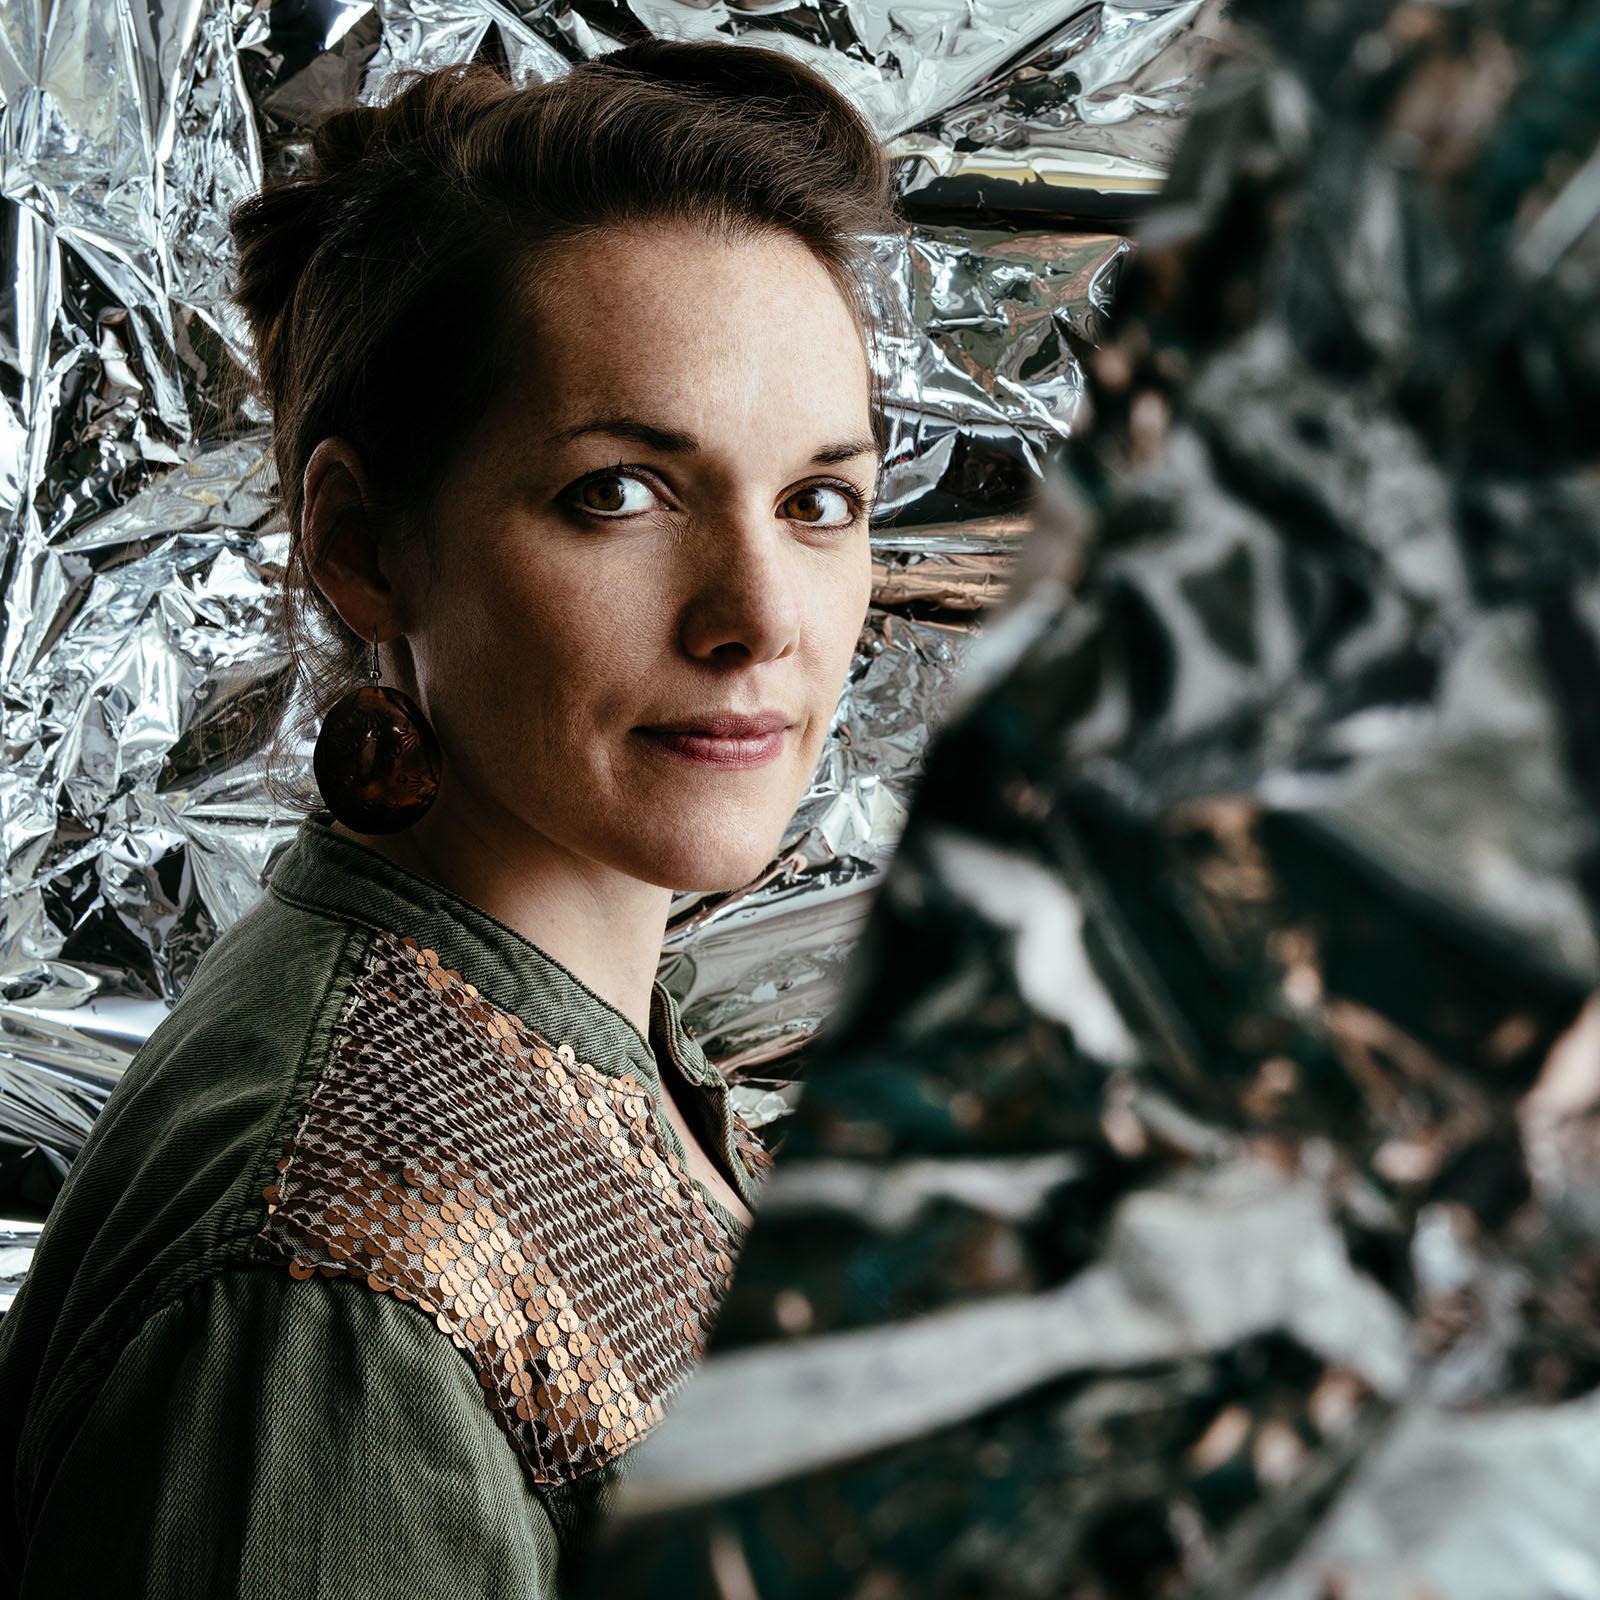 Maria Finkelmeier headshot amid crinkled reflective background